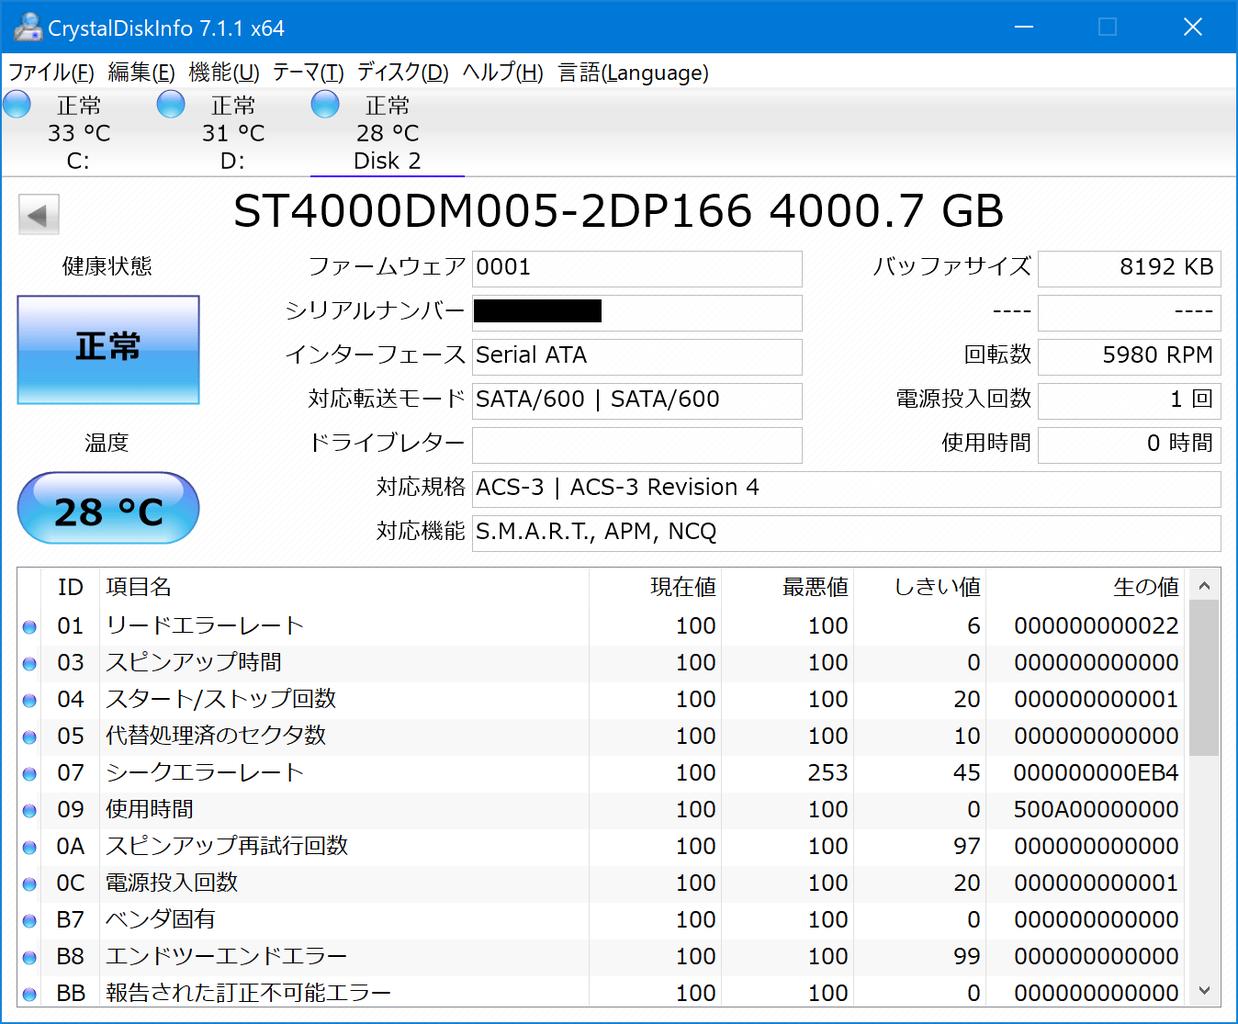 ST4000DM005 CrystalDiskInfo